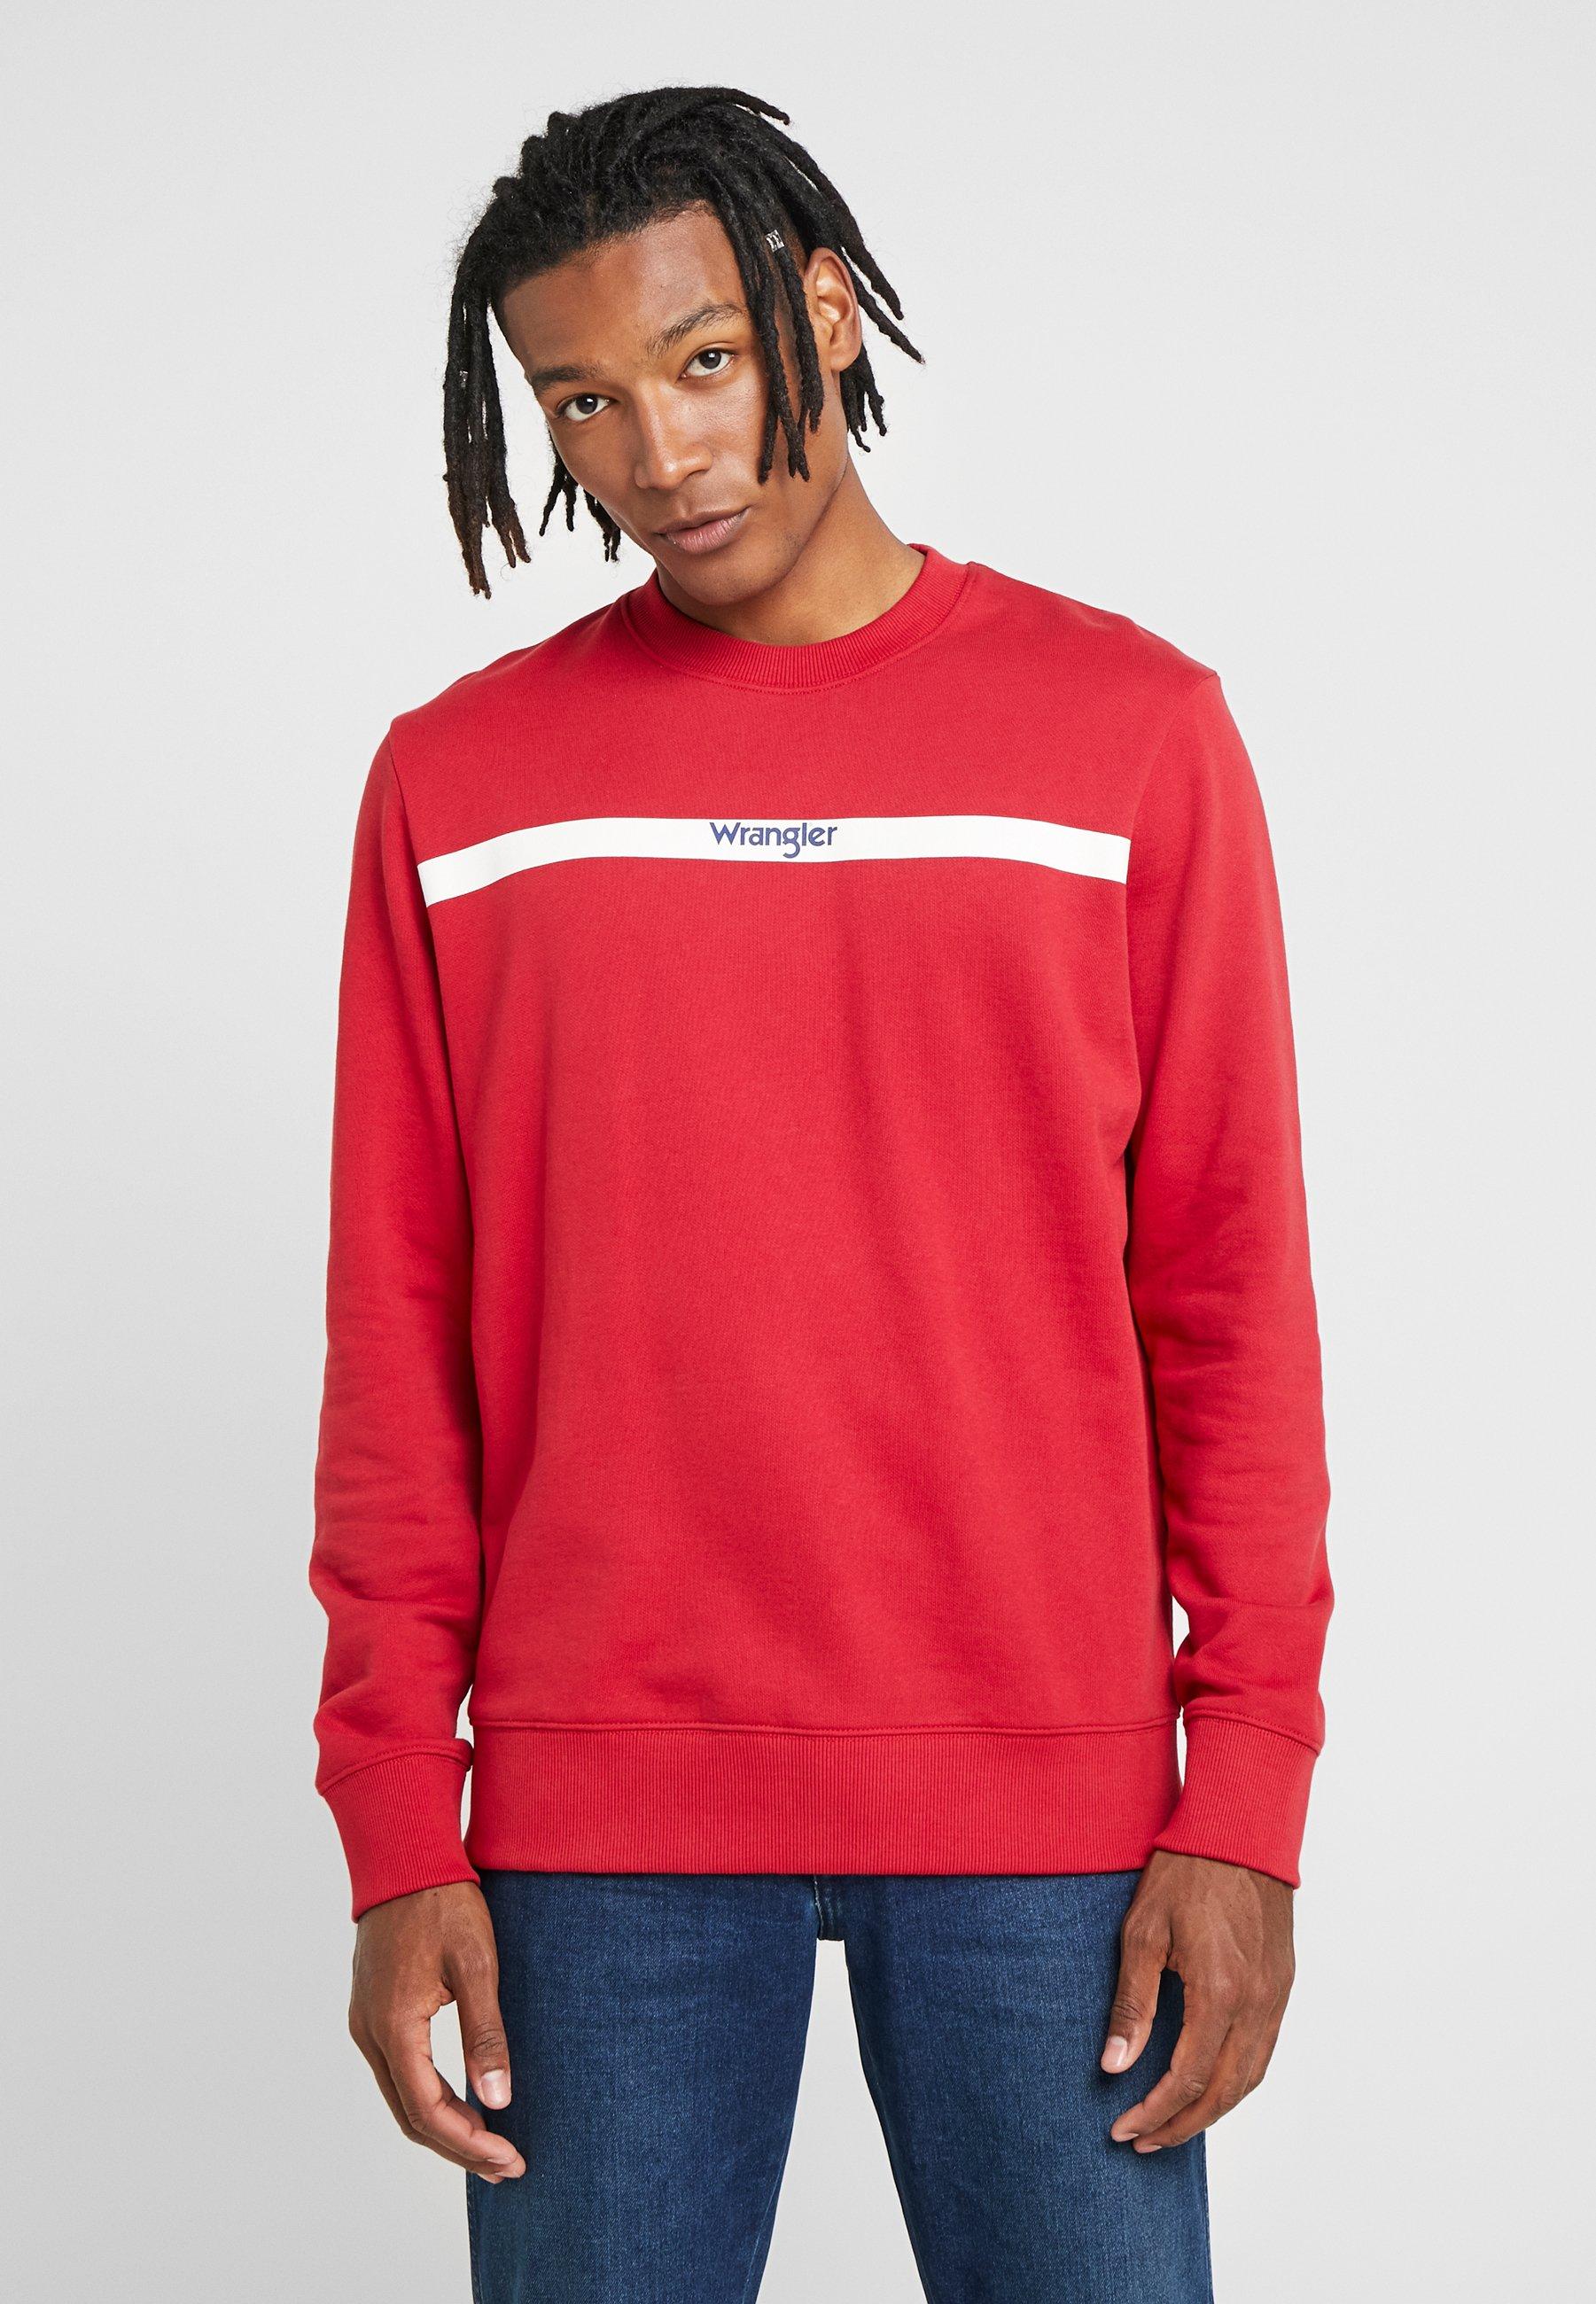 Stripe Stripe Red LogoSweatshirt LogoSweatshirt Red LogoSweatshirt Red Wrangler Wrangler Stripe Wrangler Wrangler Stripe DEHYI29W